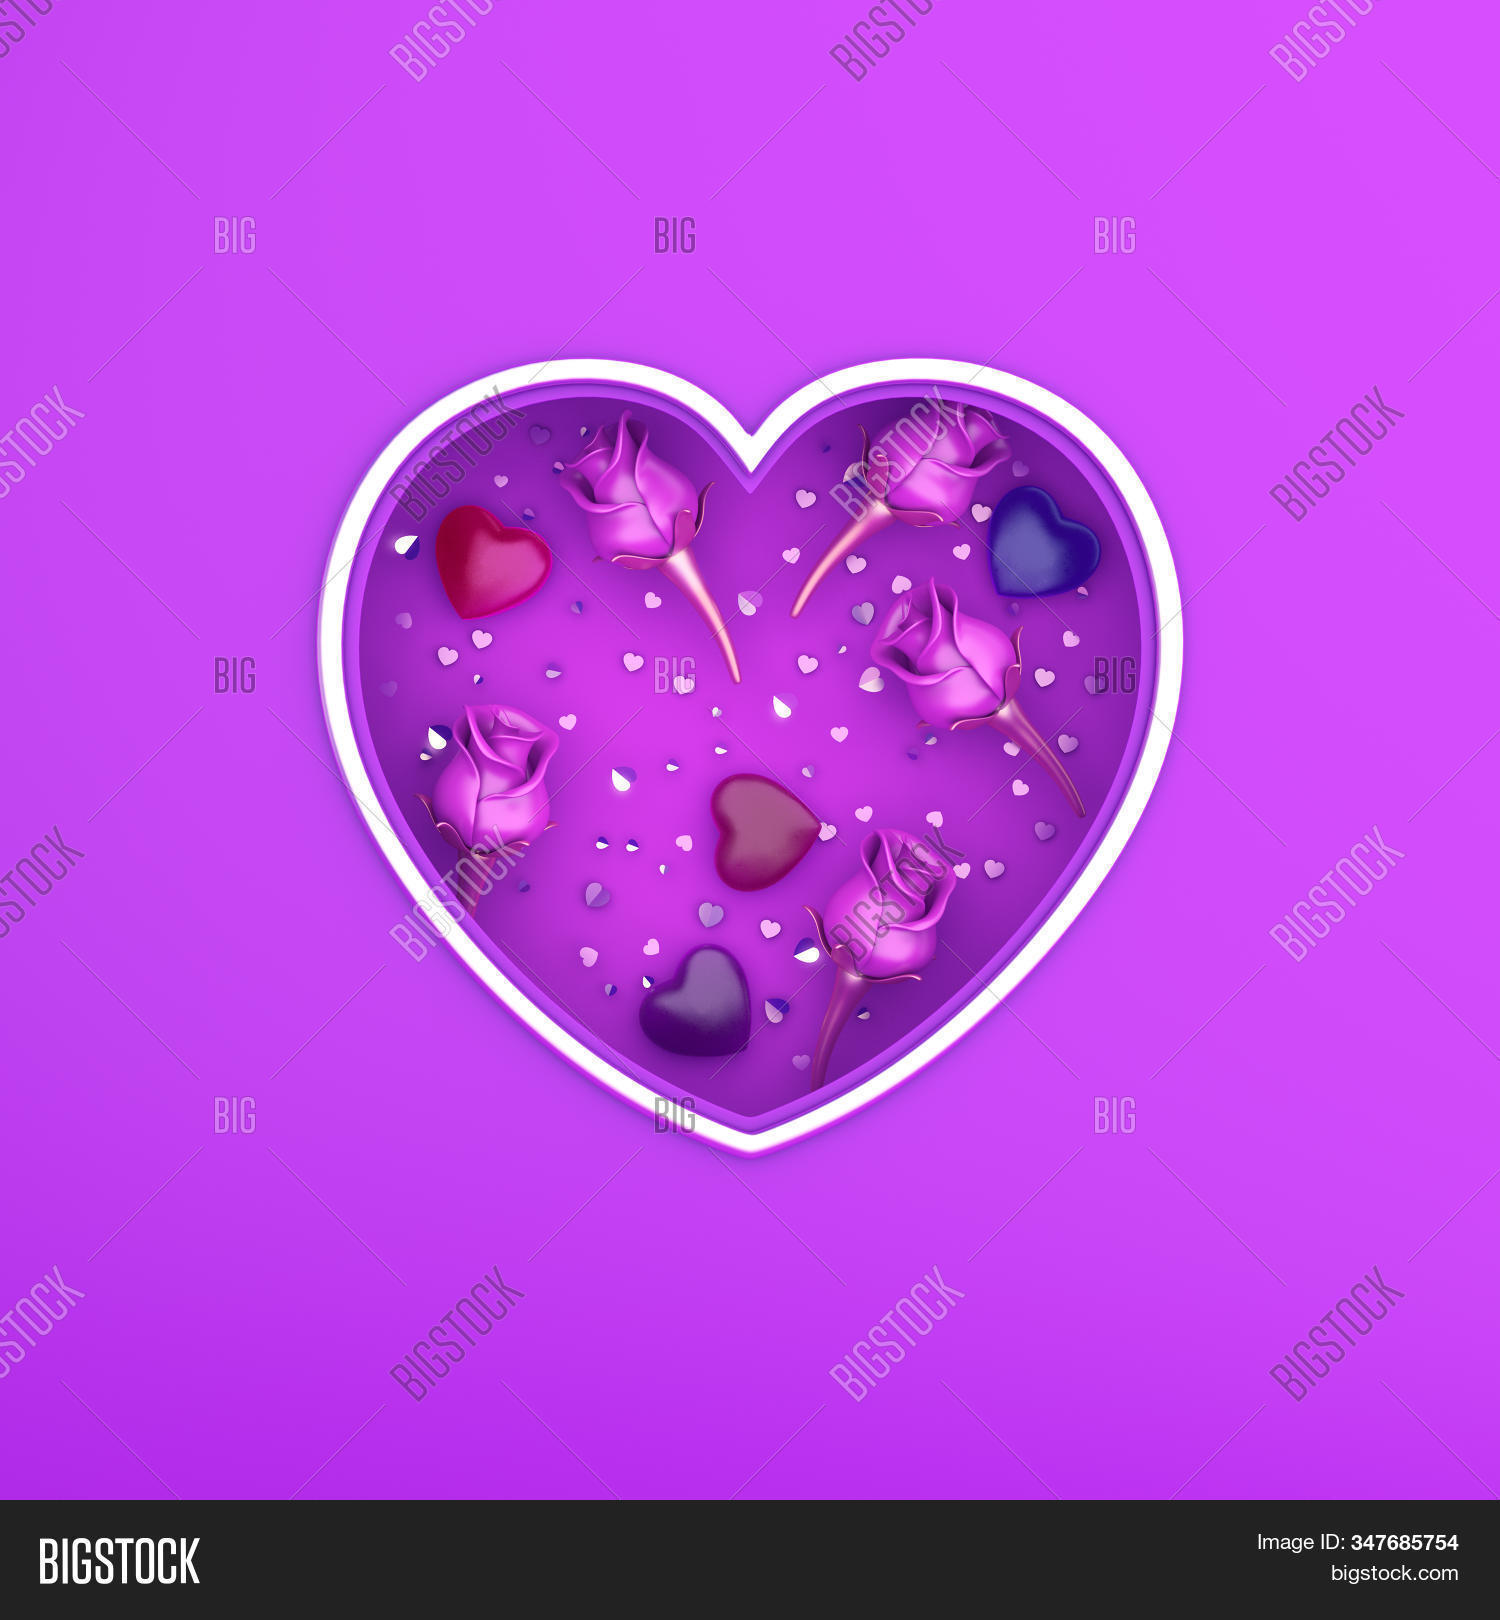 Happy Valentines Day Image Photo Free Trial Bigstock